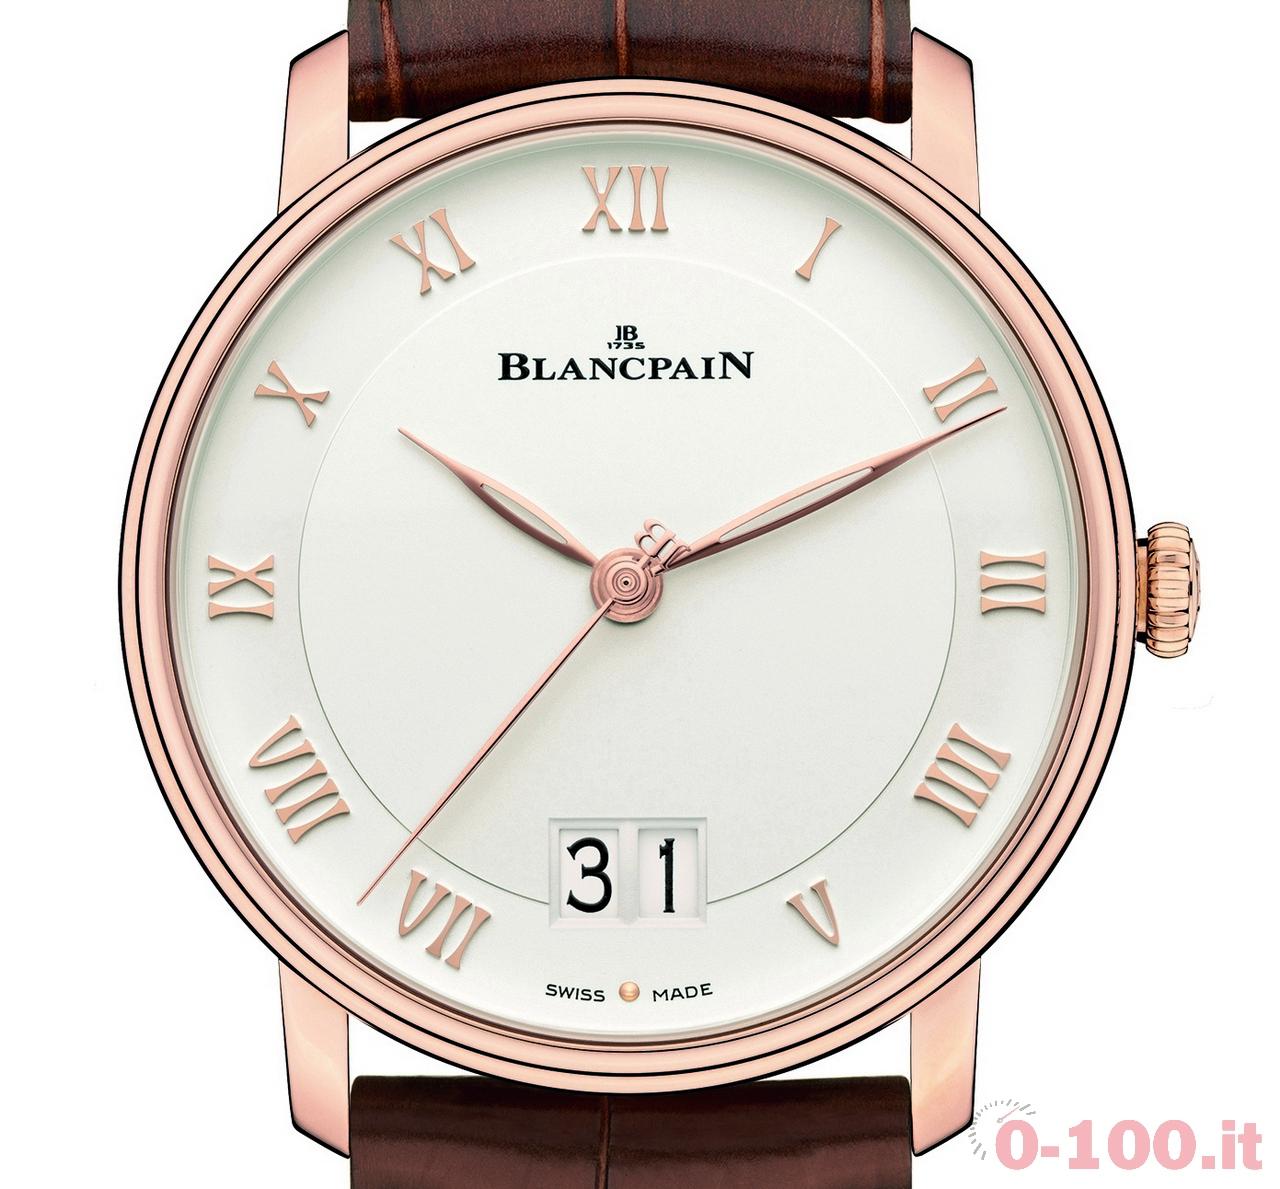 anteprima-baselworld-2015-blancpain-villeret-grande-date-ref-6669-3642-55b_0-100_4